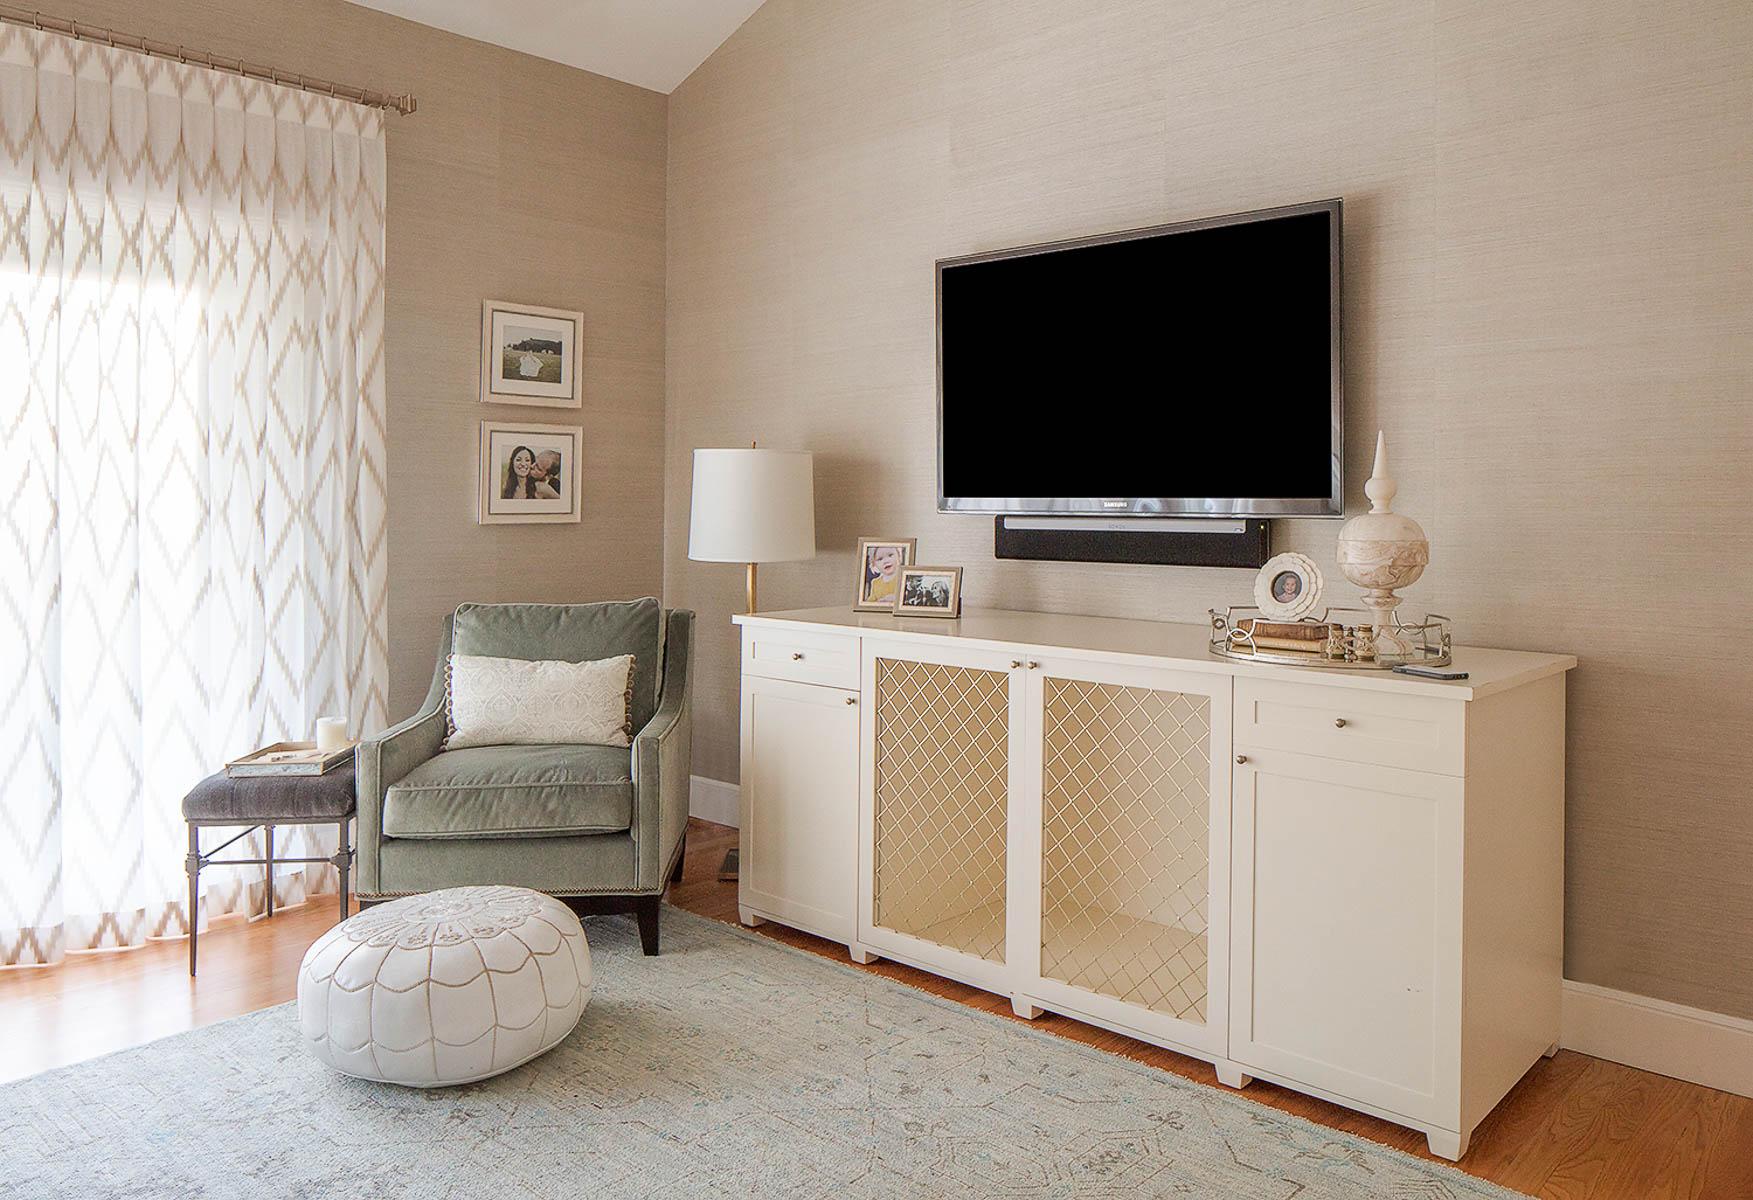 LMB_Interiors_Hillsborough_Green_Design_Dog_Crate_TV_Cabinet_Empty